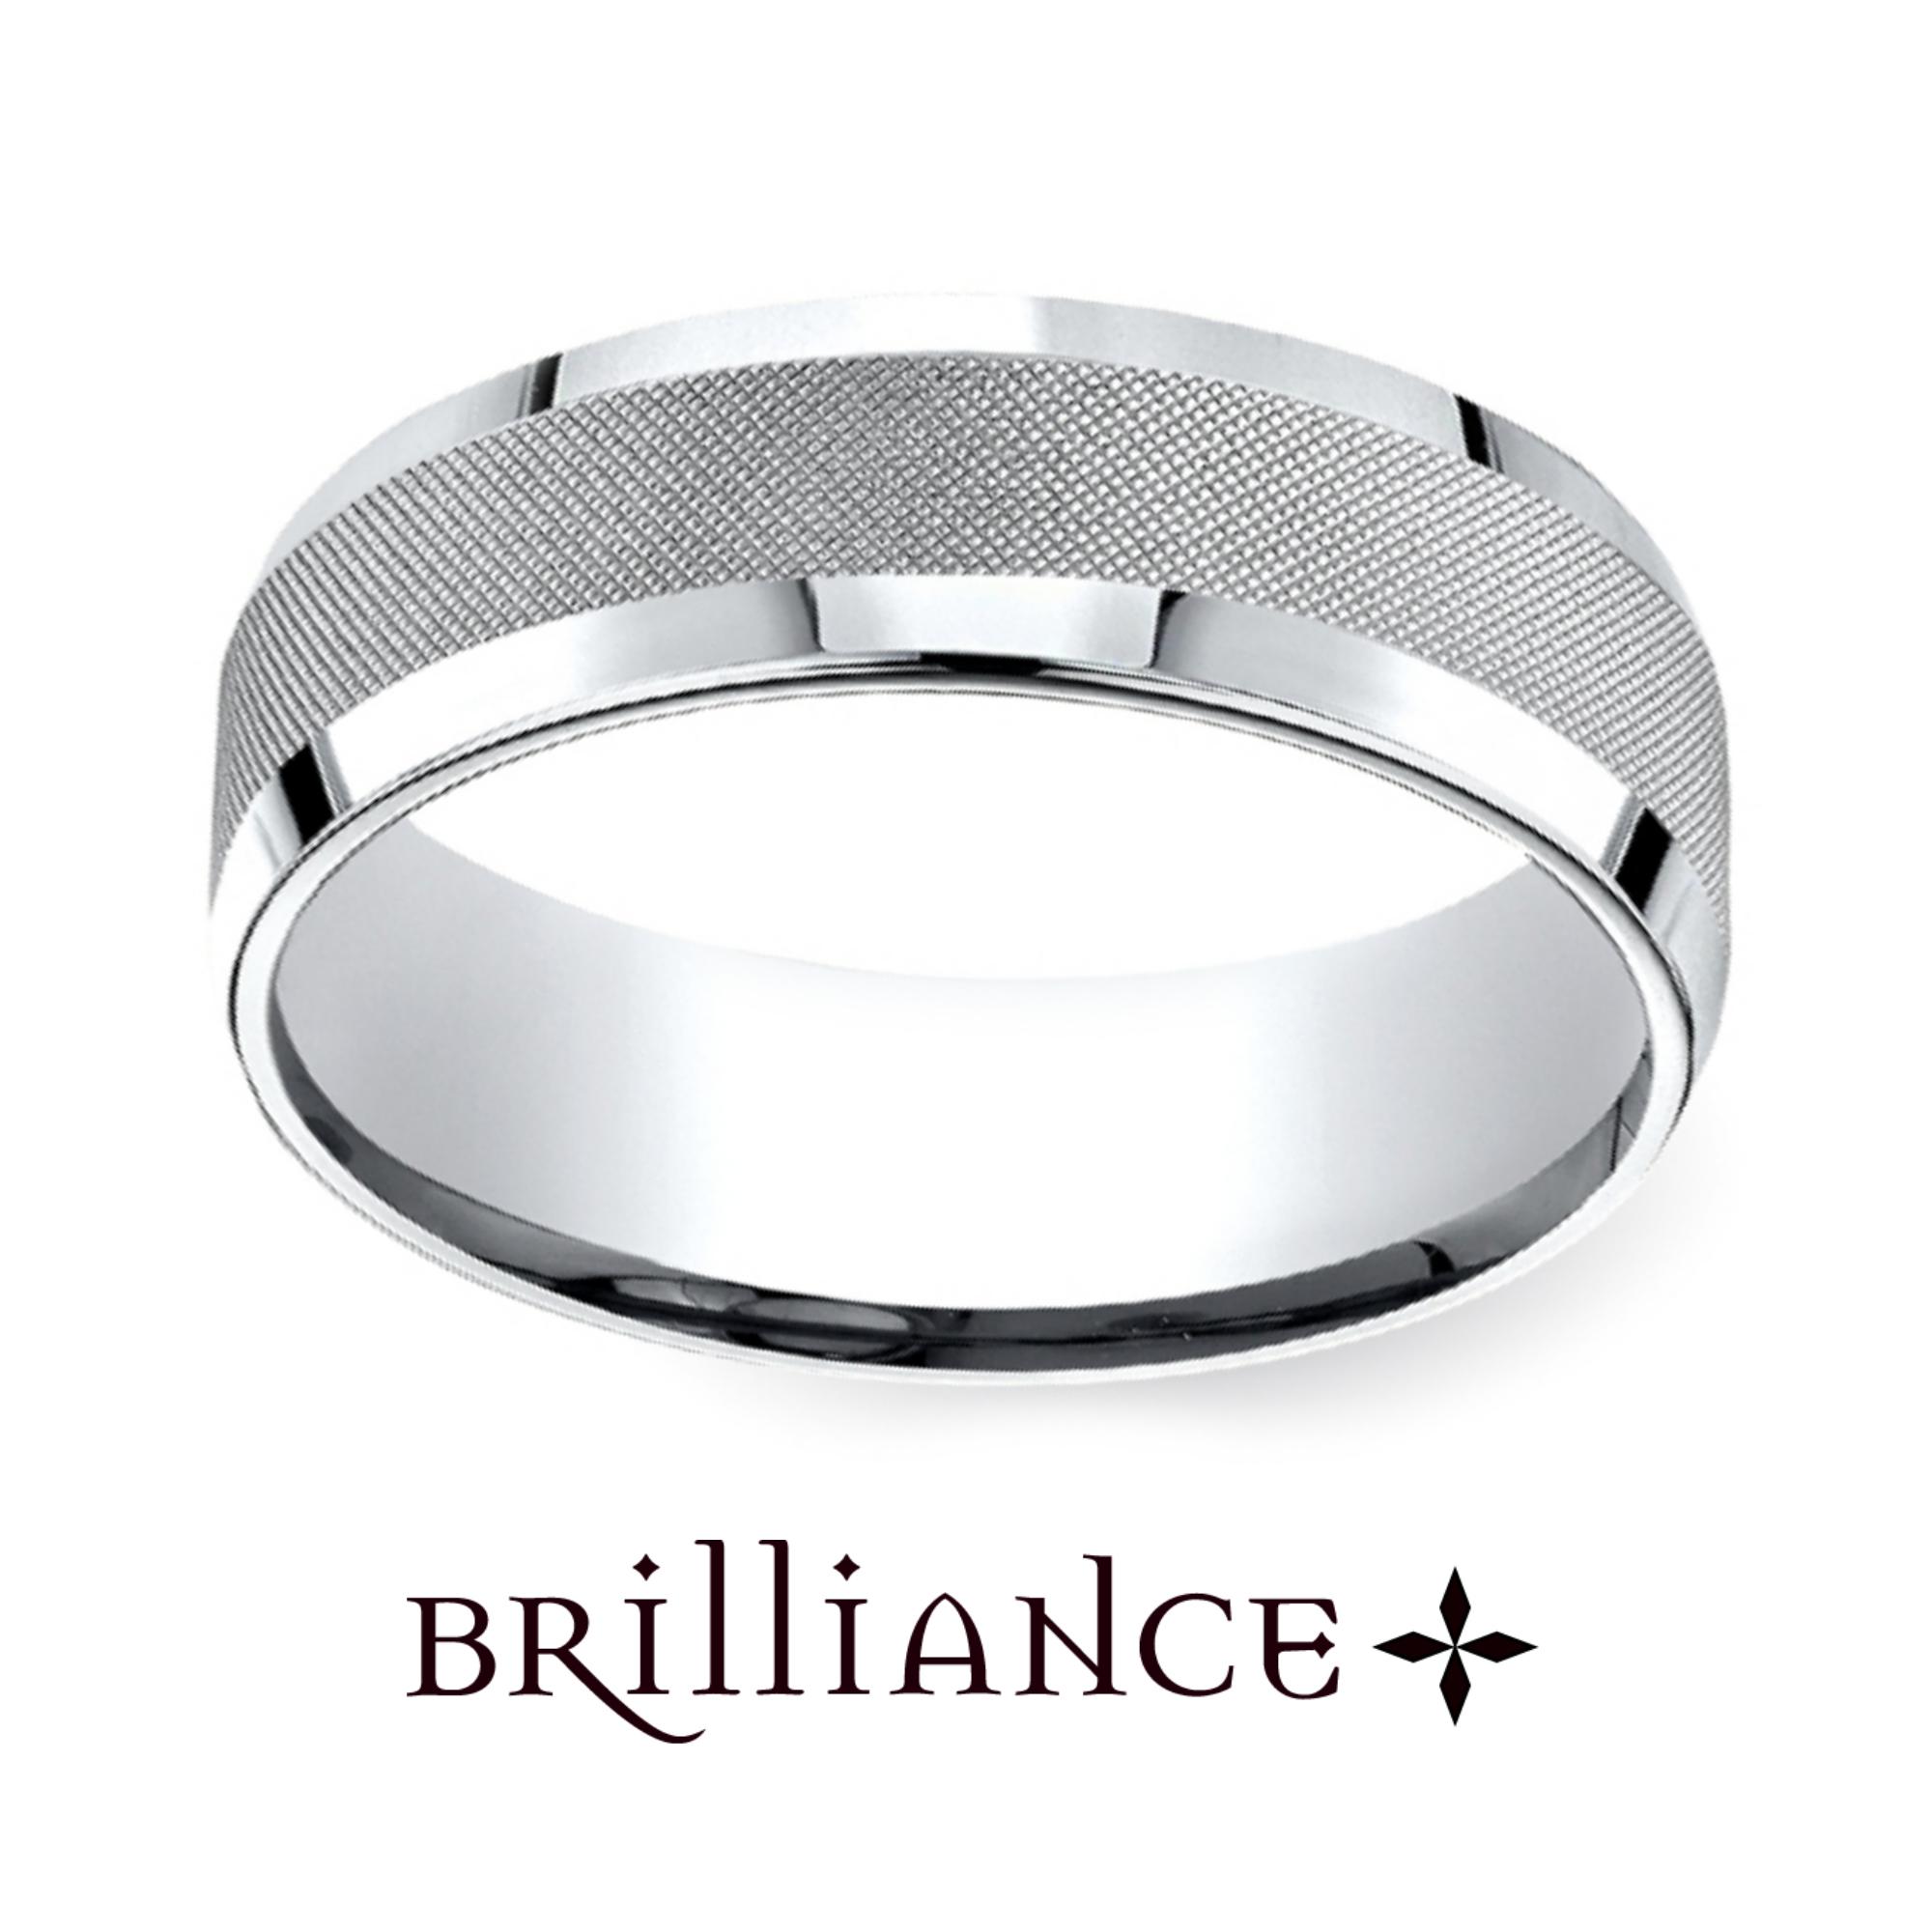 cross hatch men s wedding ring in white gold http www brilliance